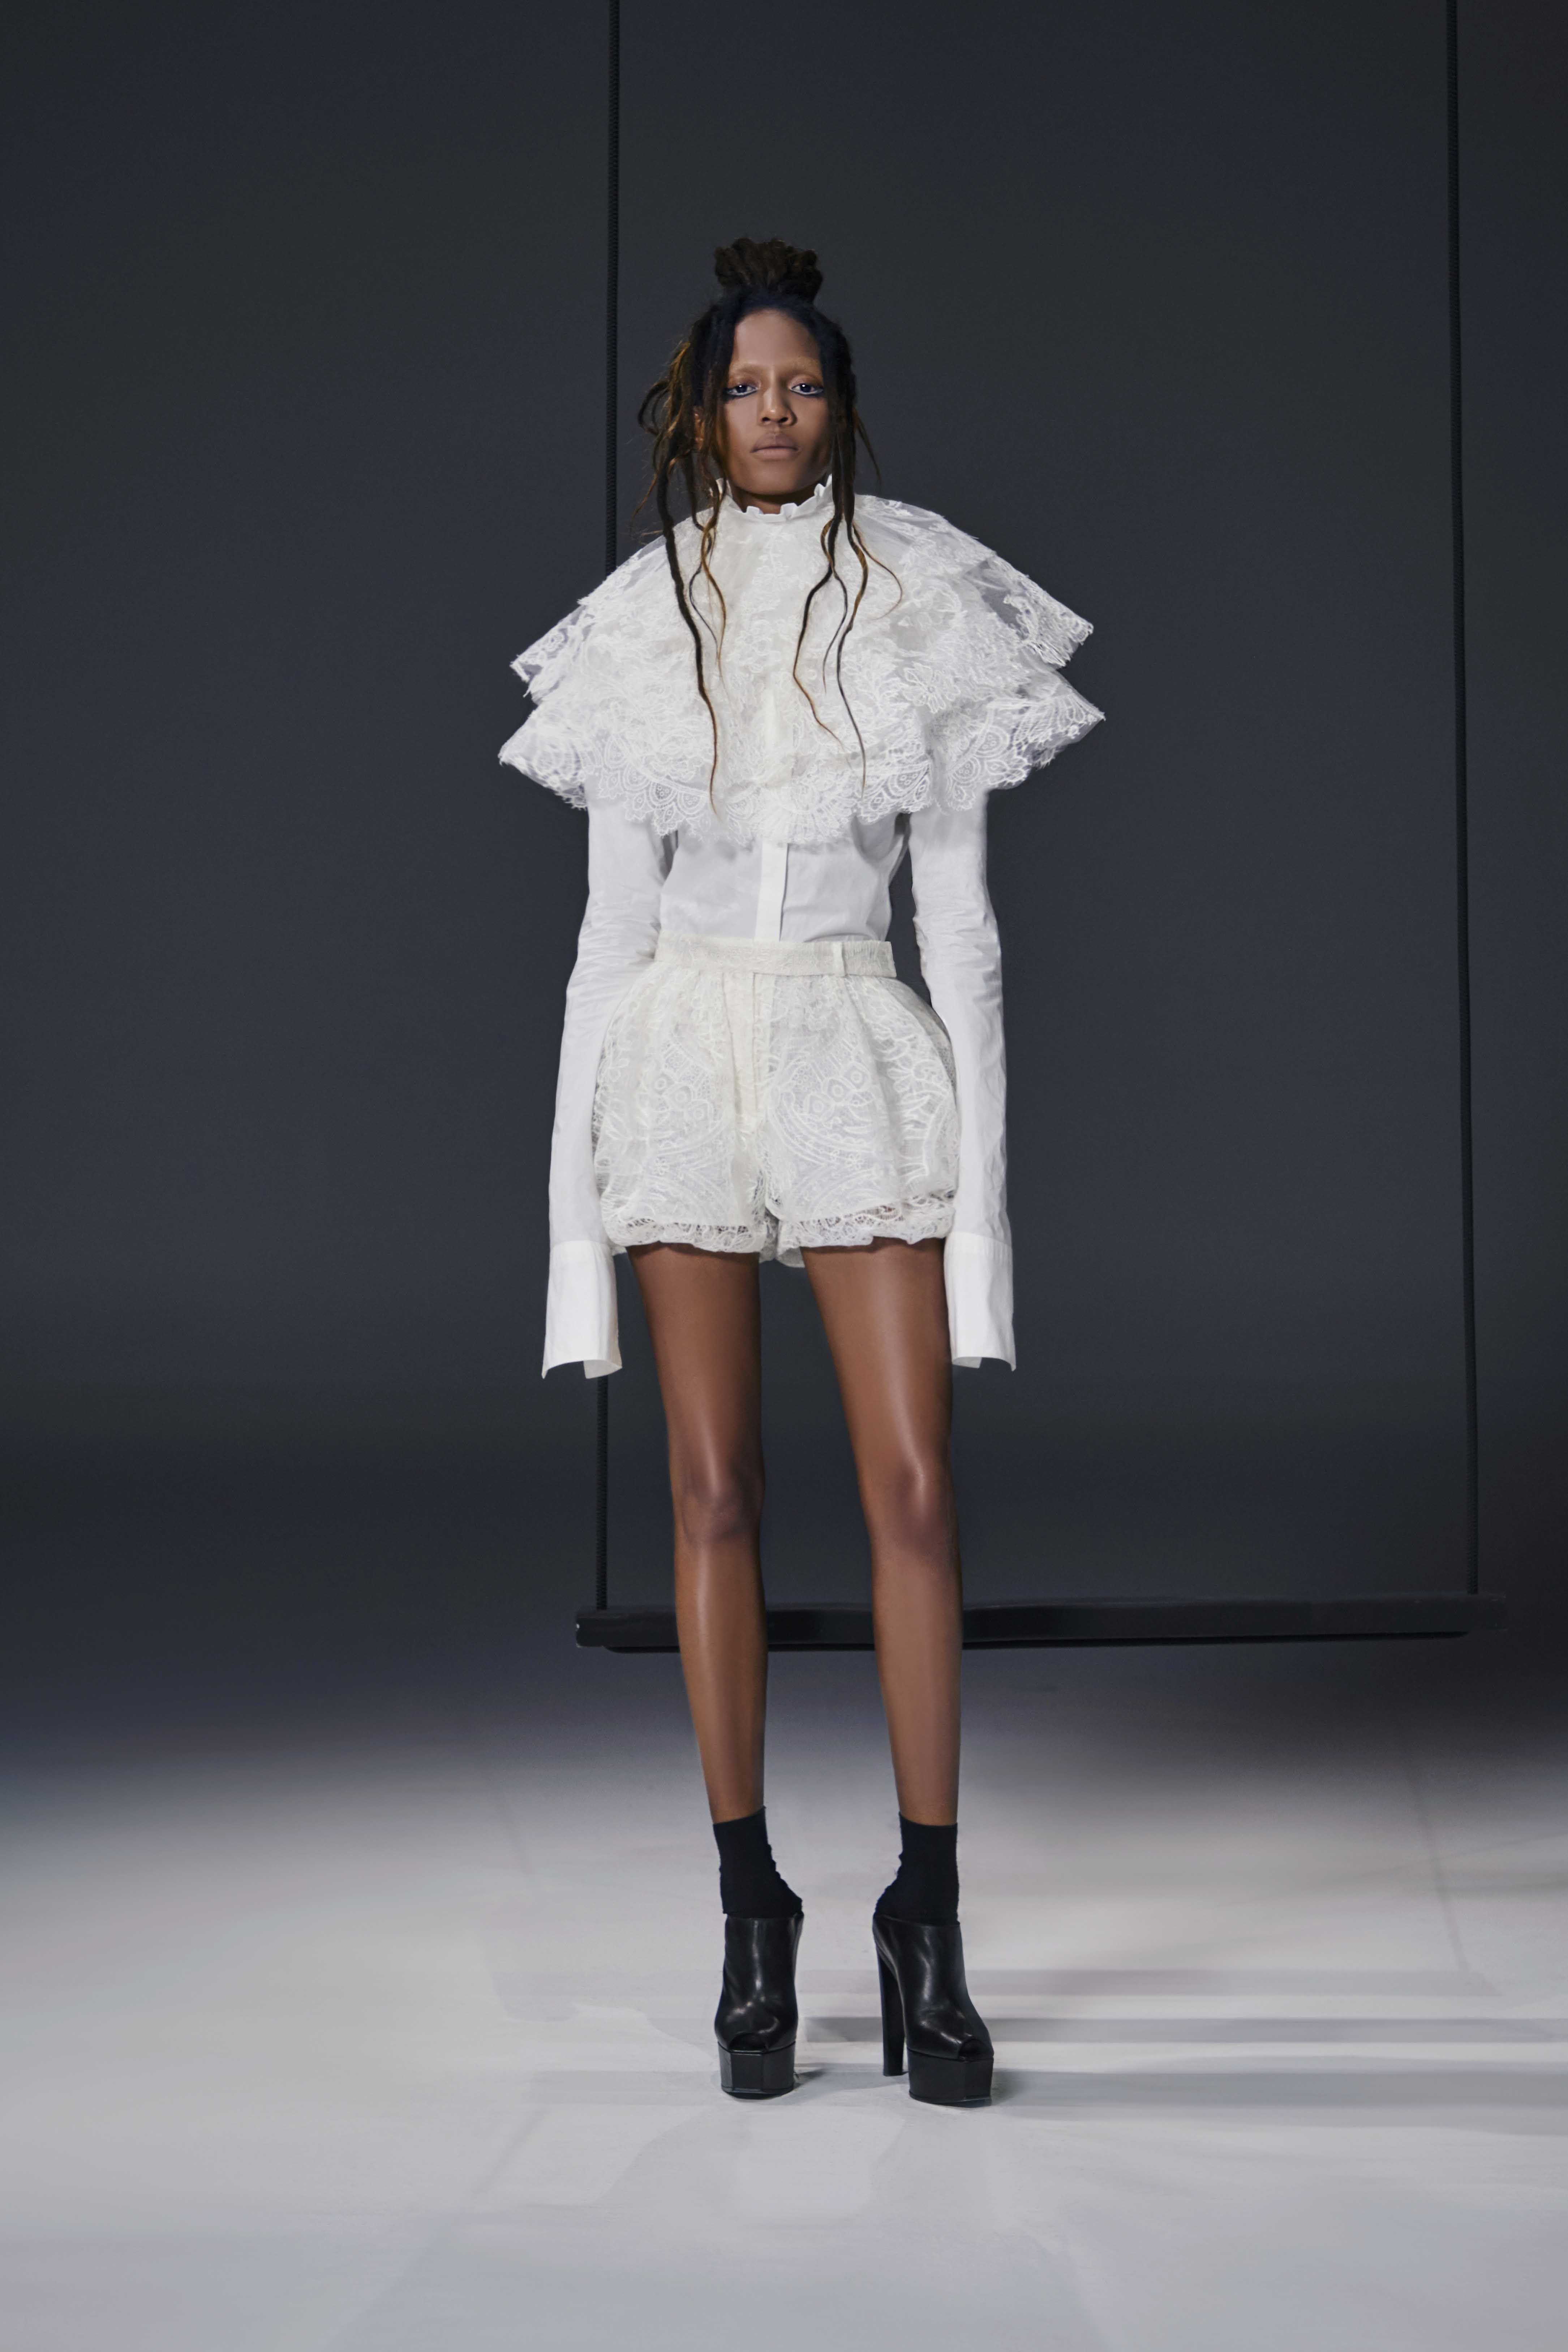 Vera Wang RTW Spring 2019 White cotton poplin men s shirt Light ivory  macramé lace bloomer Light ivory macramé lace exaggerated three tier collar 9576bdb22